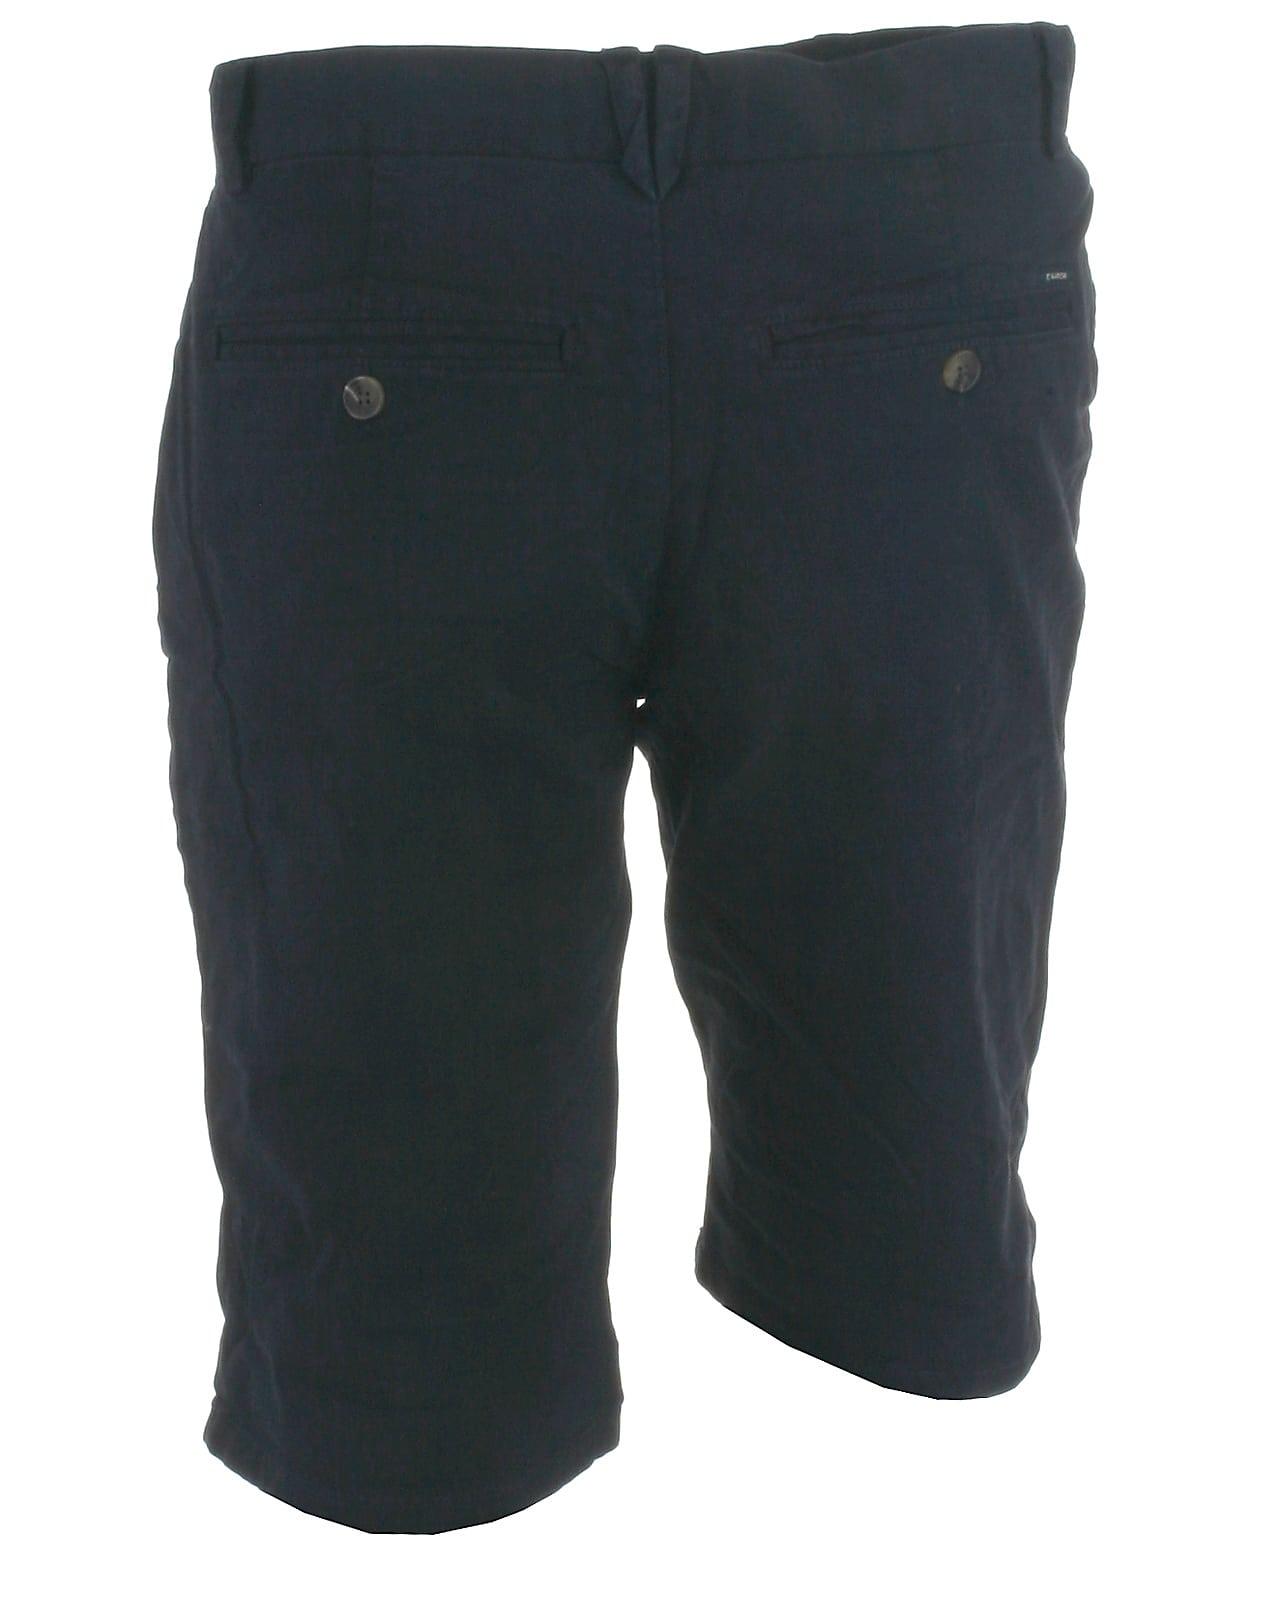 Image of Garcia chino shorts, darkmoon